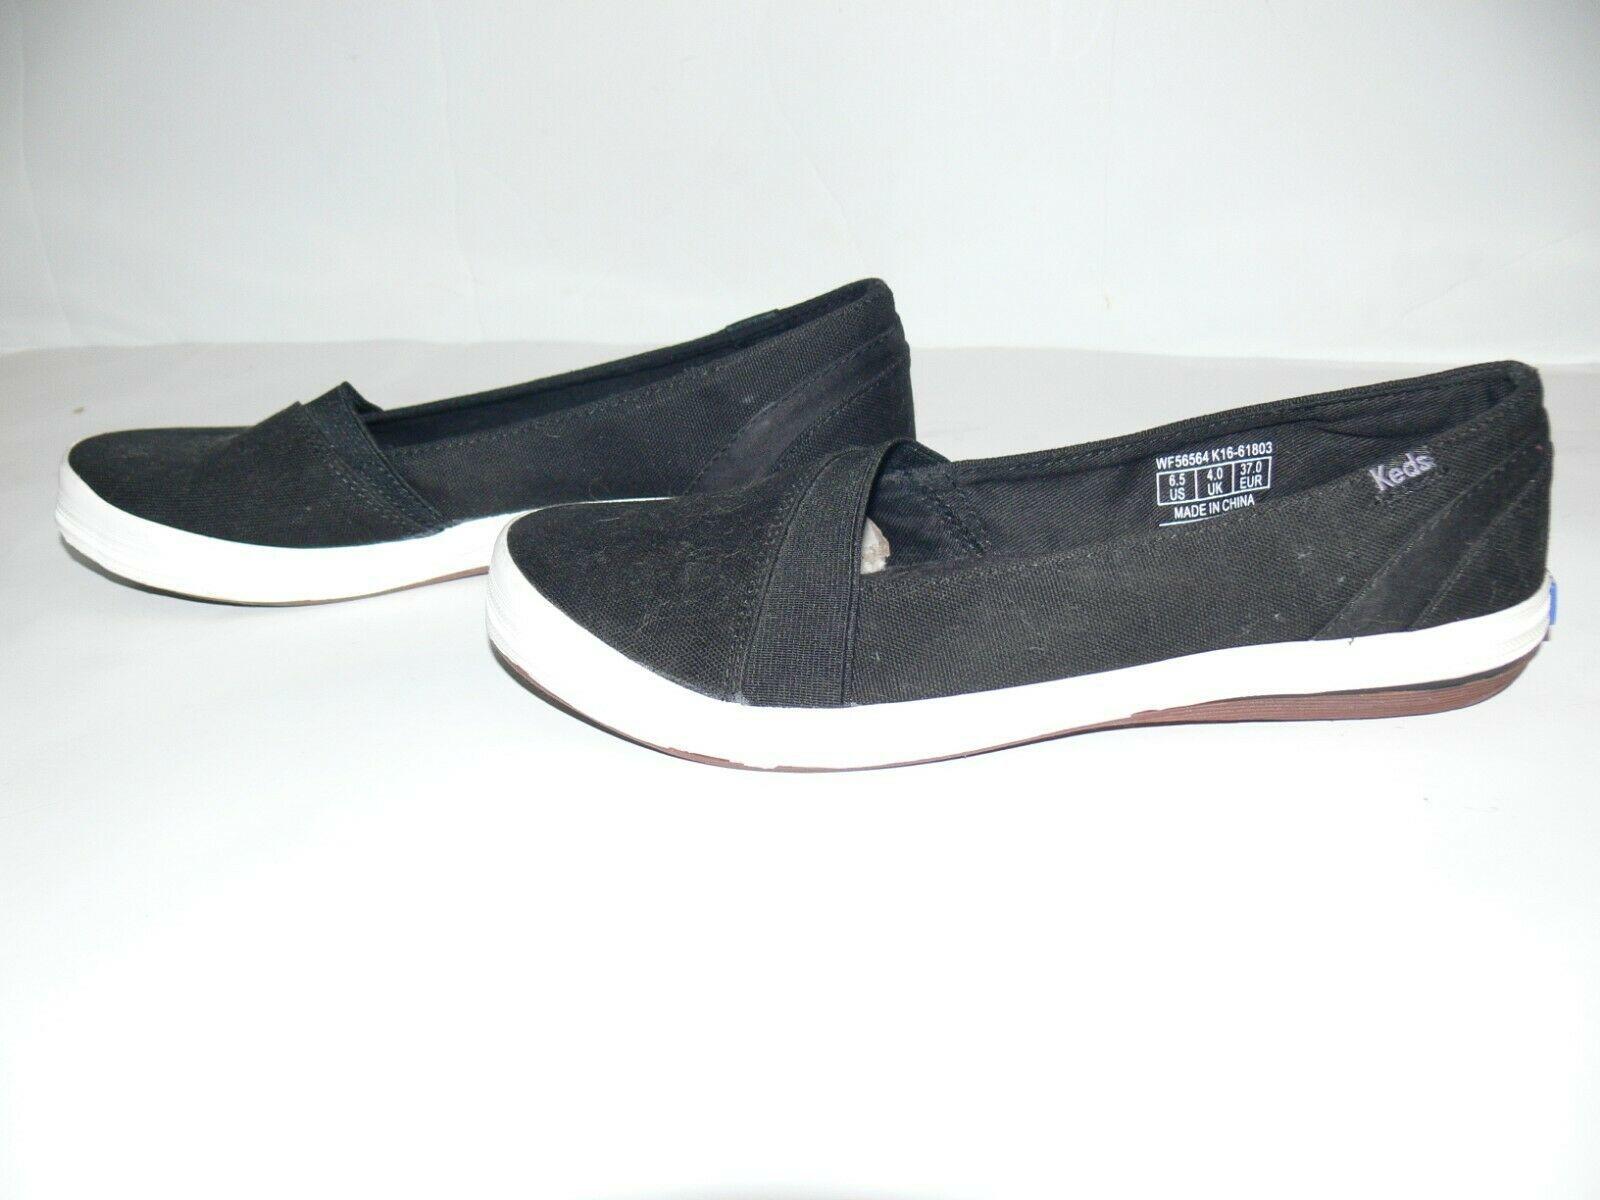 Keds Ortholite Tennis Shoe Black Slip On Womens Size 6.5 US nb